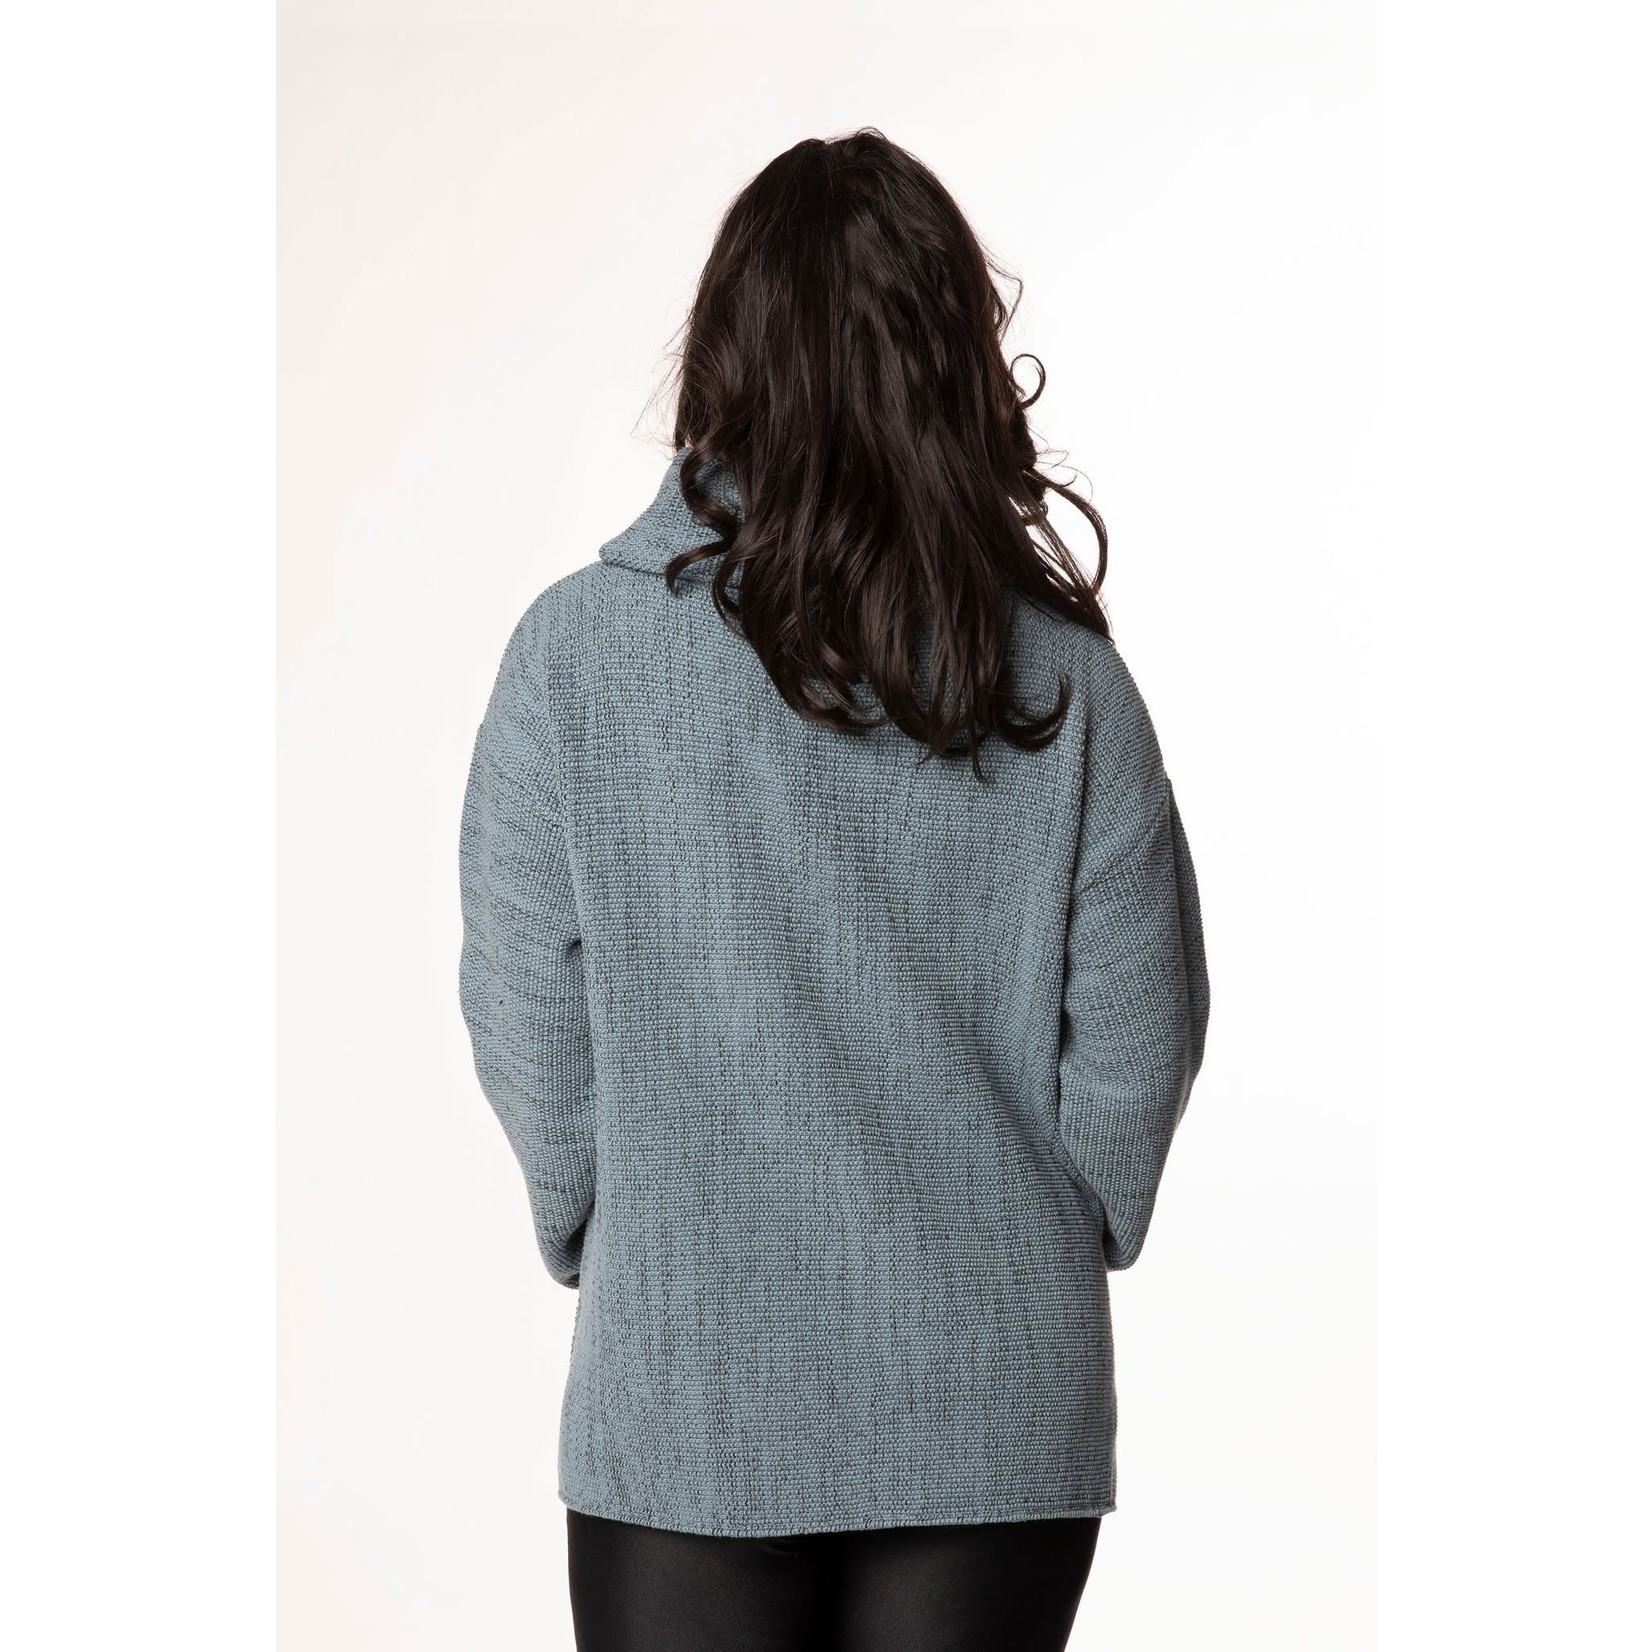 Margaret Winters Cowl Neck Sweater in Rain